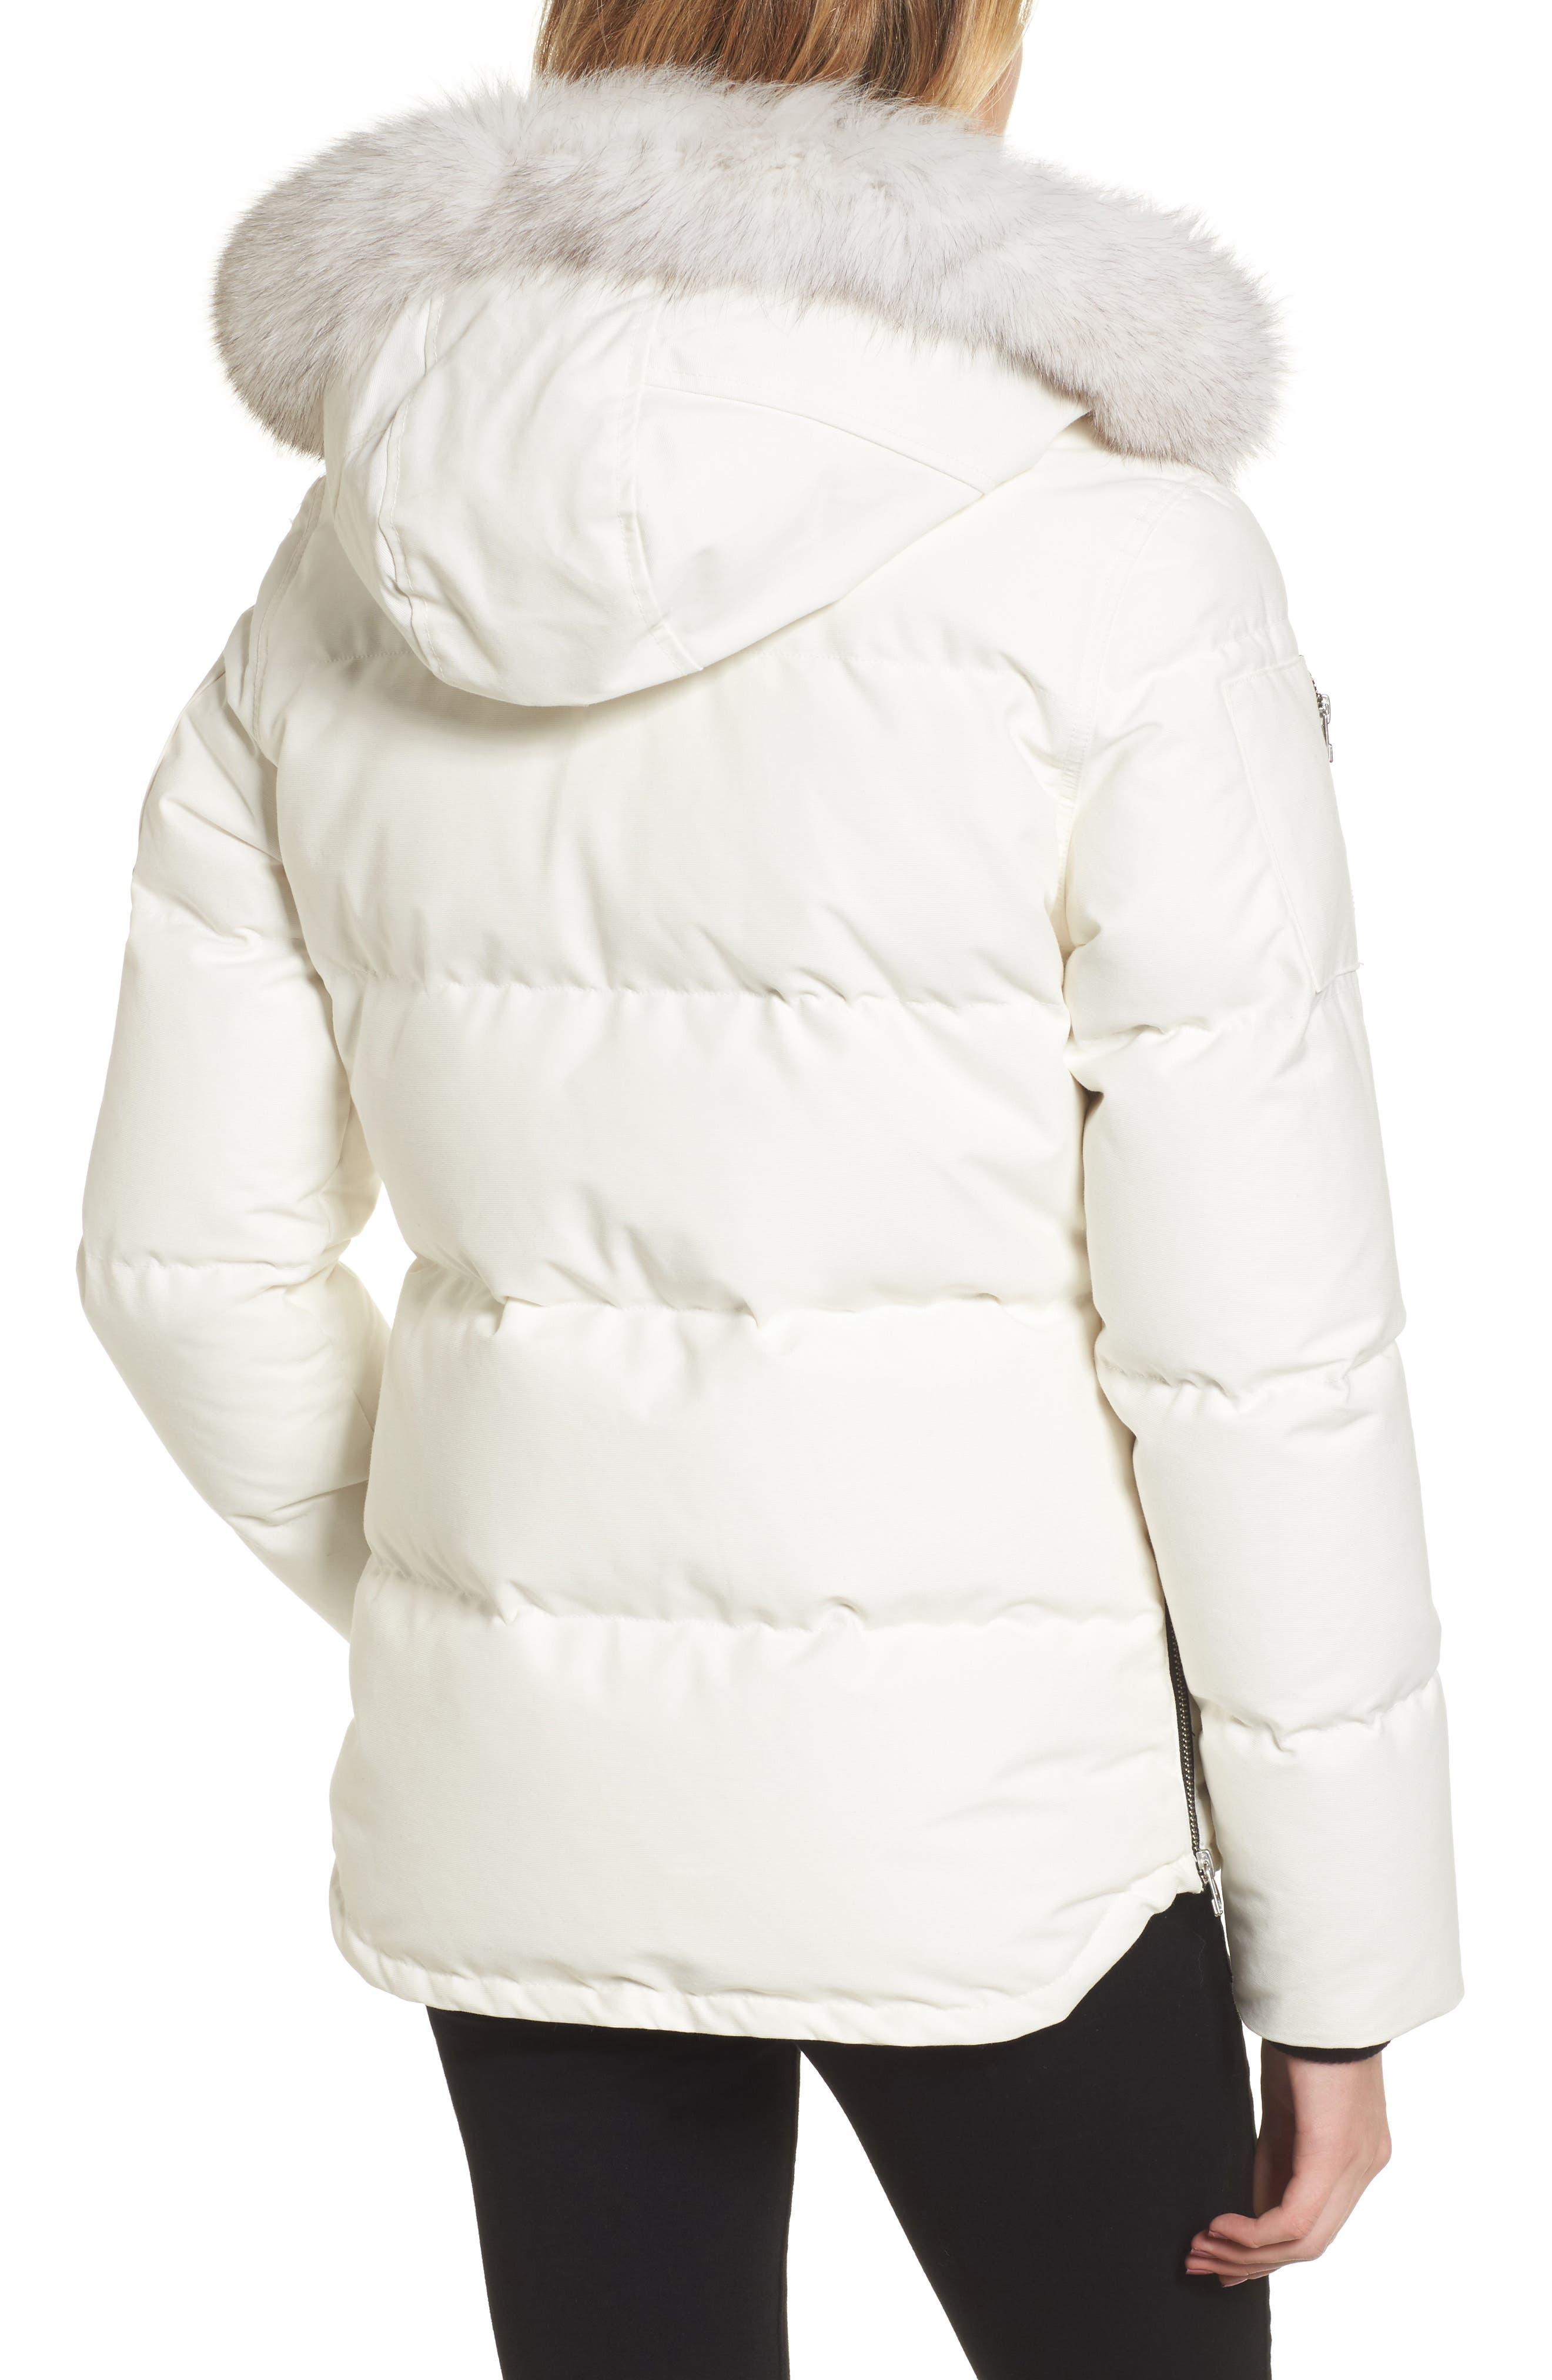 Genuine Fox Fur Trim Hooded Down Coat,                             Alternate thumbnail 2, color,                             SNOW WHITE/ BLACK FUR